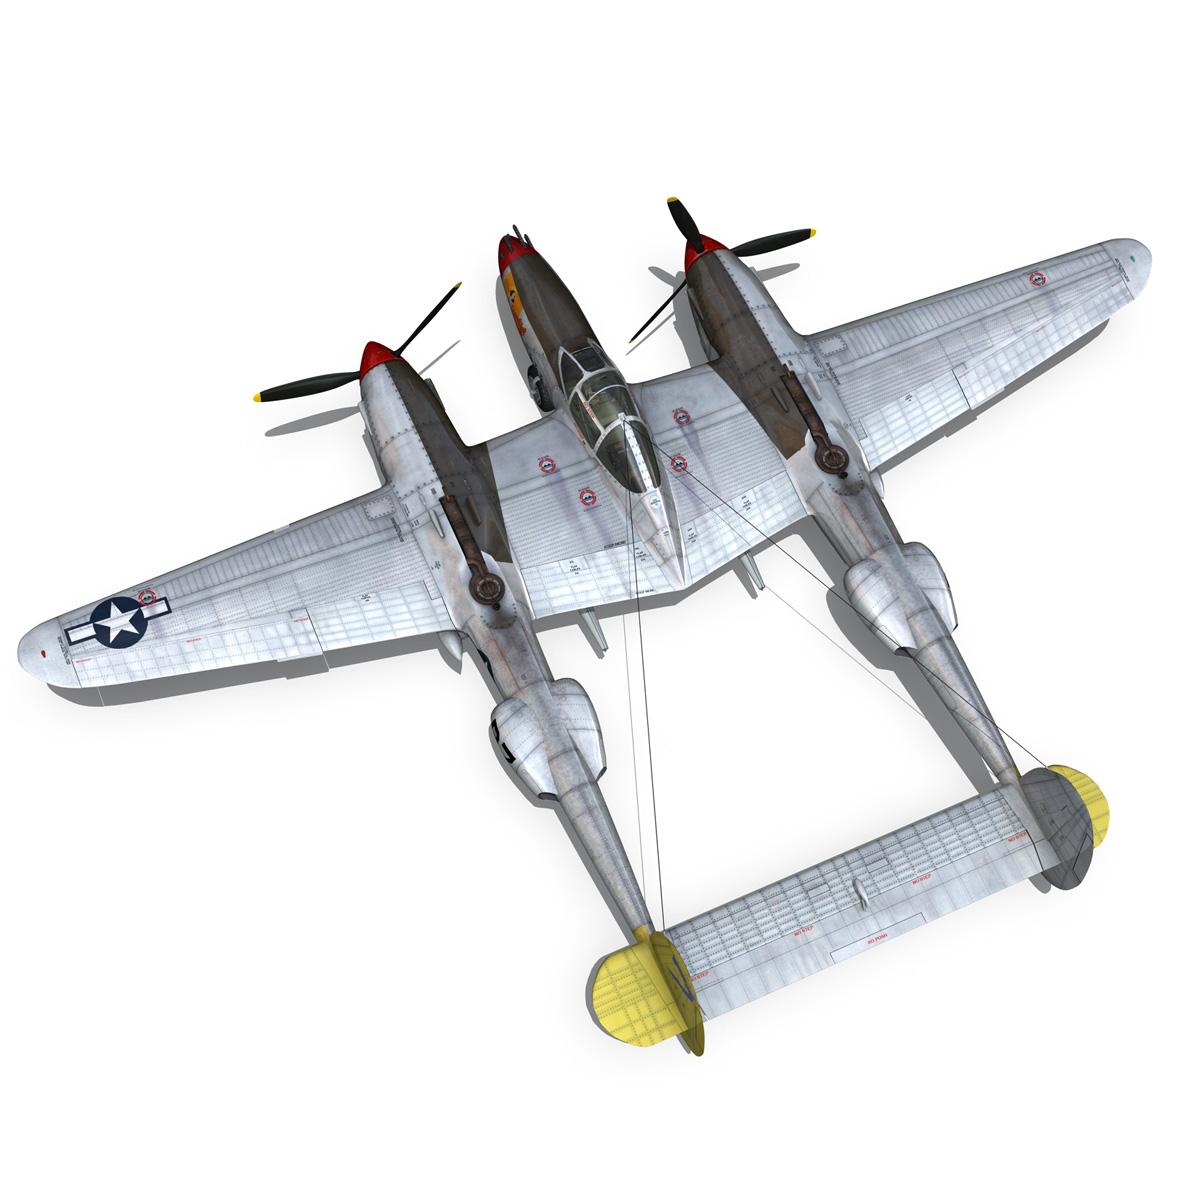 lockheed p-38 lightning – beautiful bitch 3d model fbx c4d lwo obj 272676